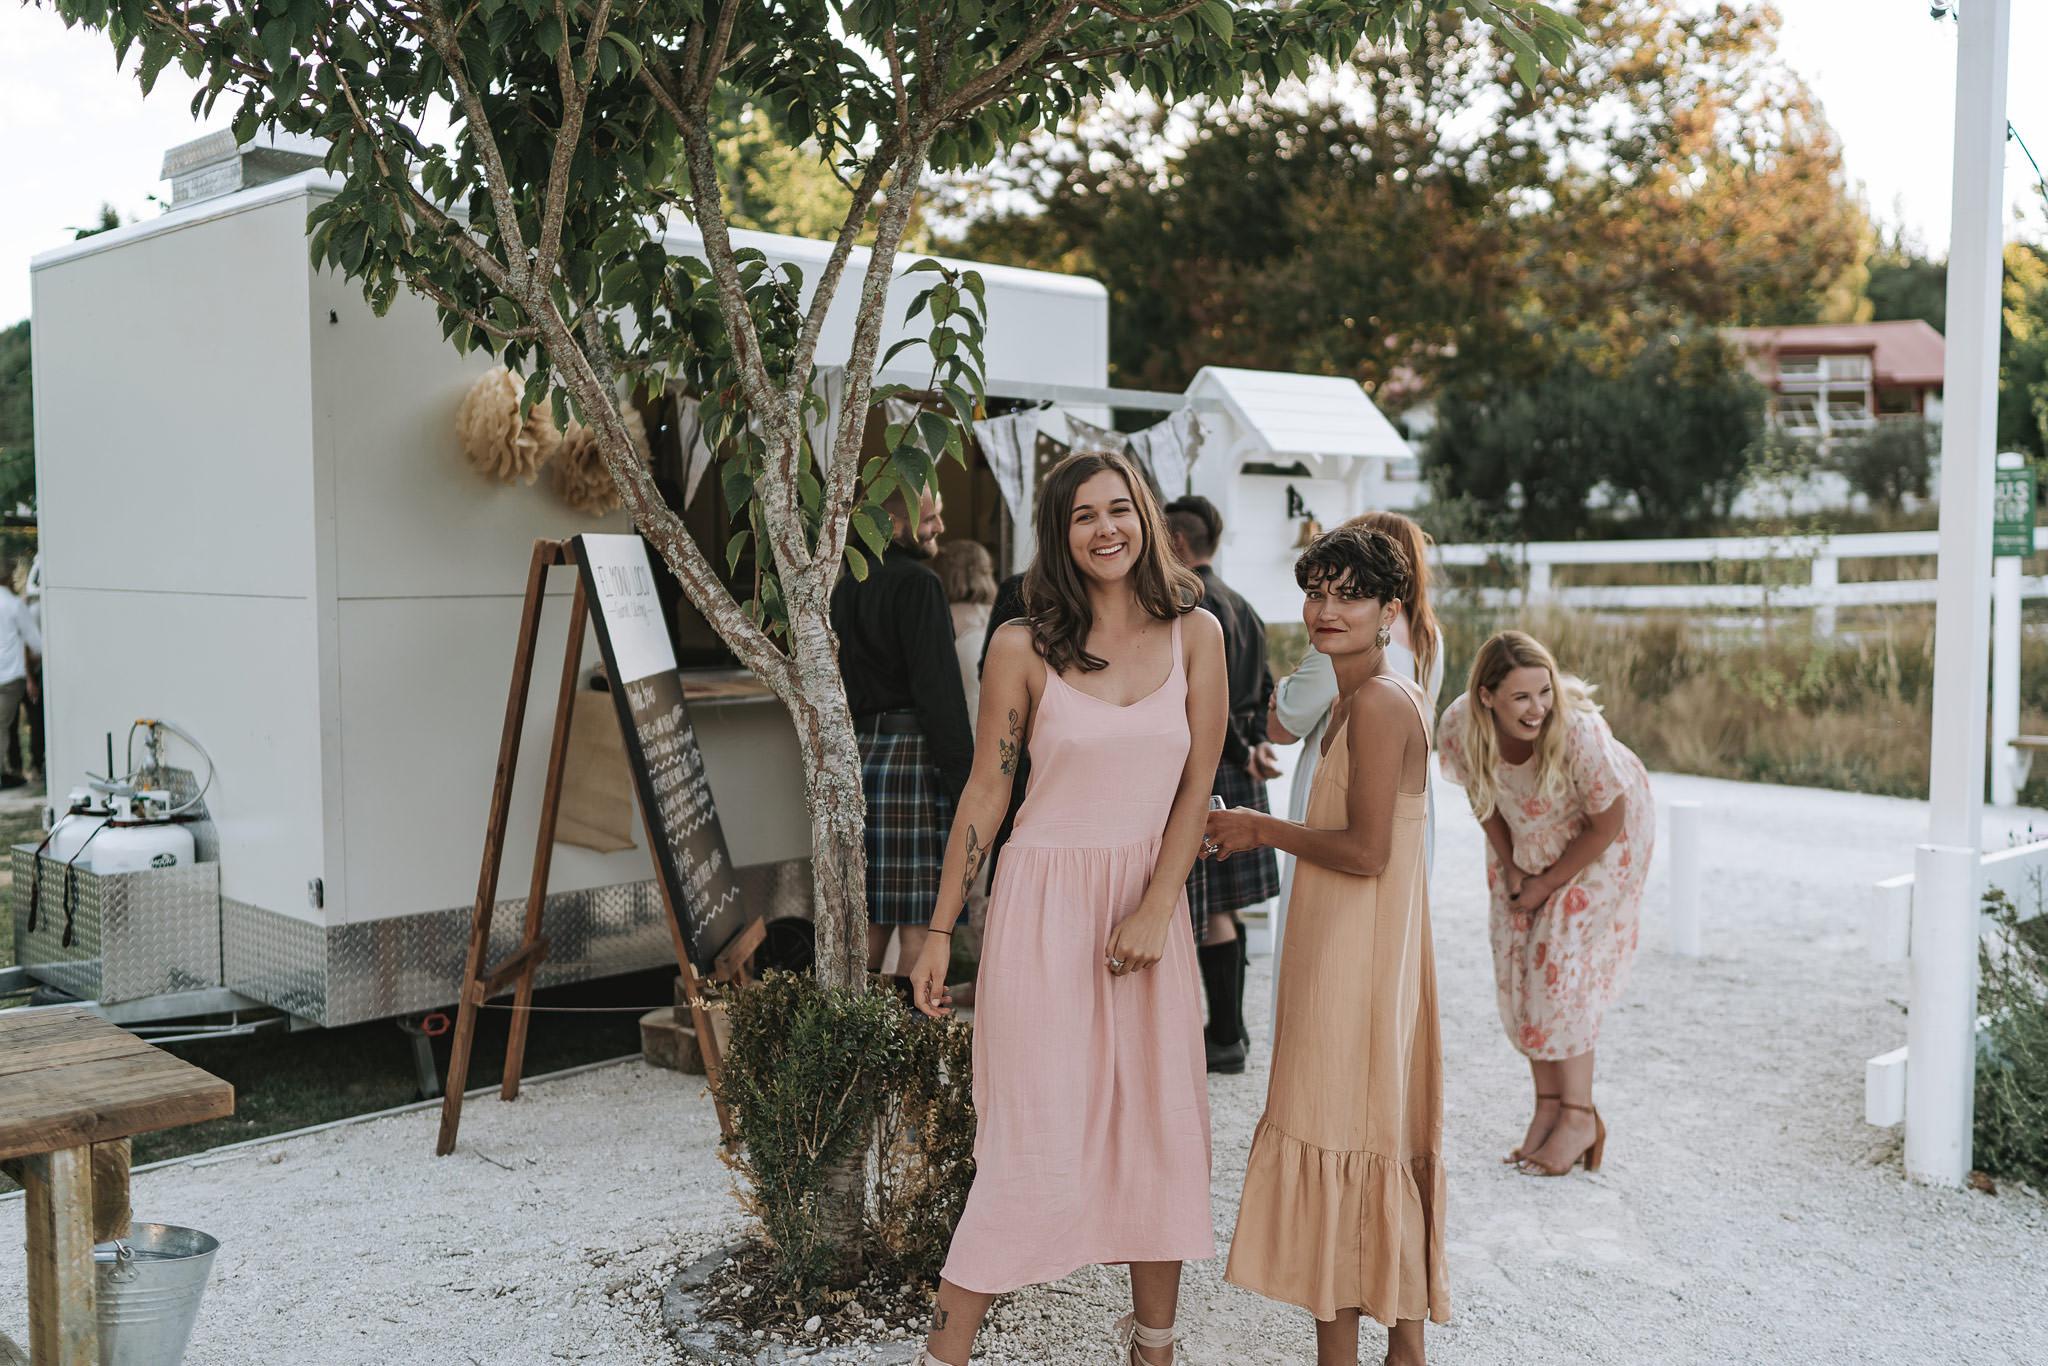 rambo-estrada-natalieryan-old-forest-school-tauranga-wedding-photographers-800-c-copy.jpg